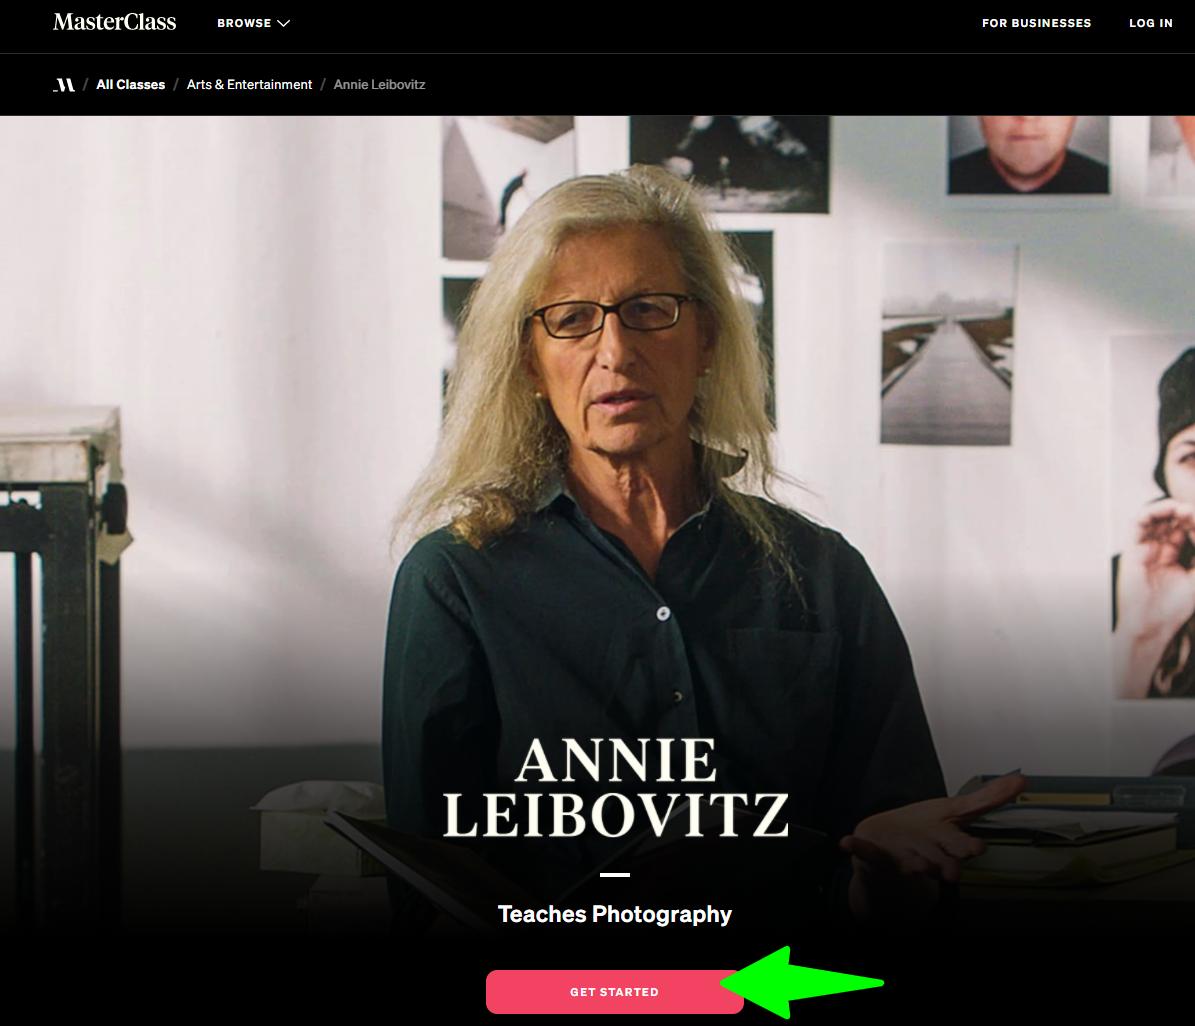 Annie-Leibovitz-Teaches-Photography